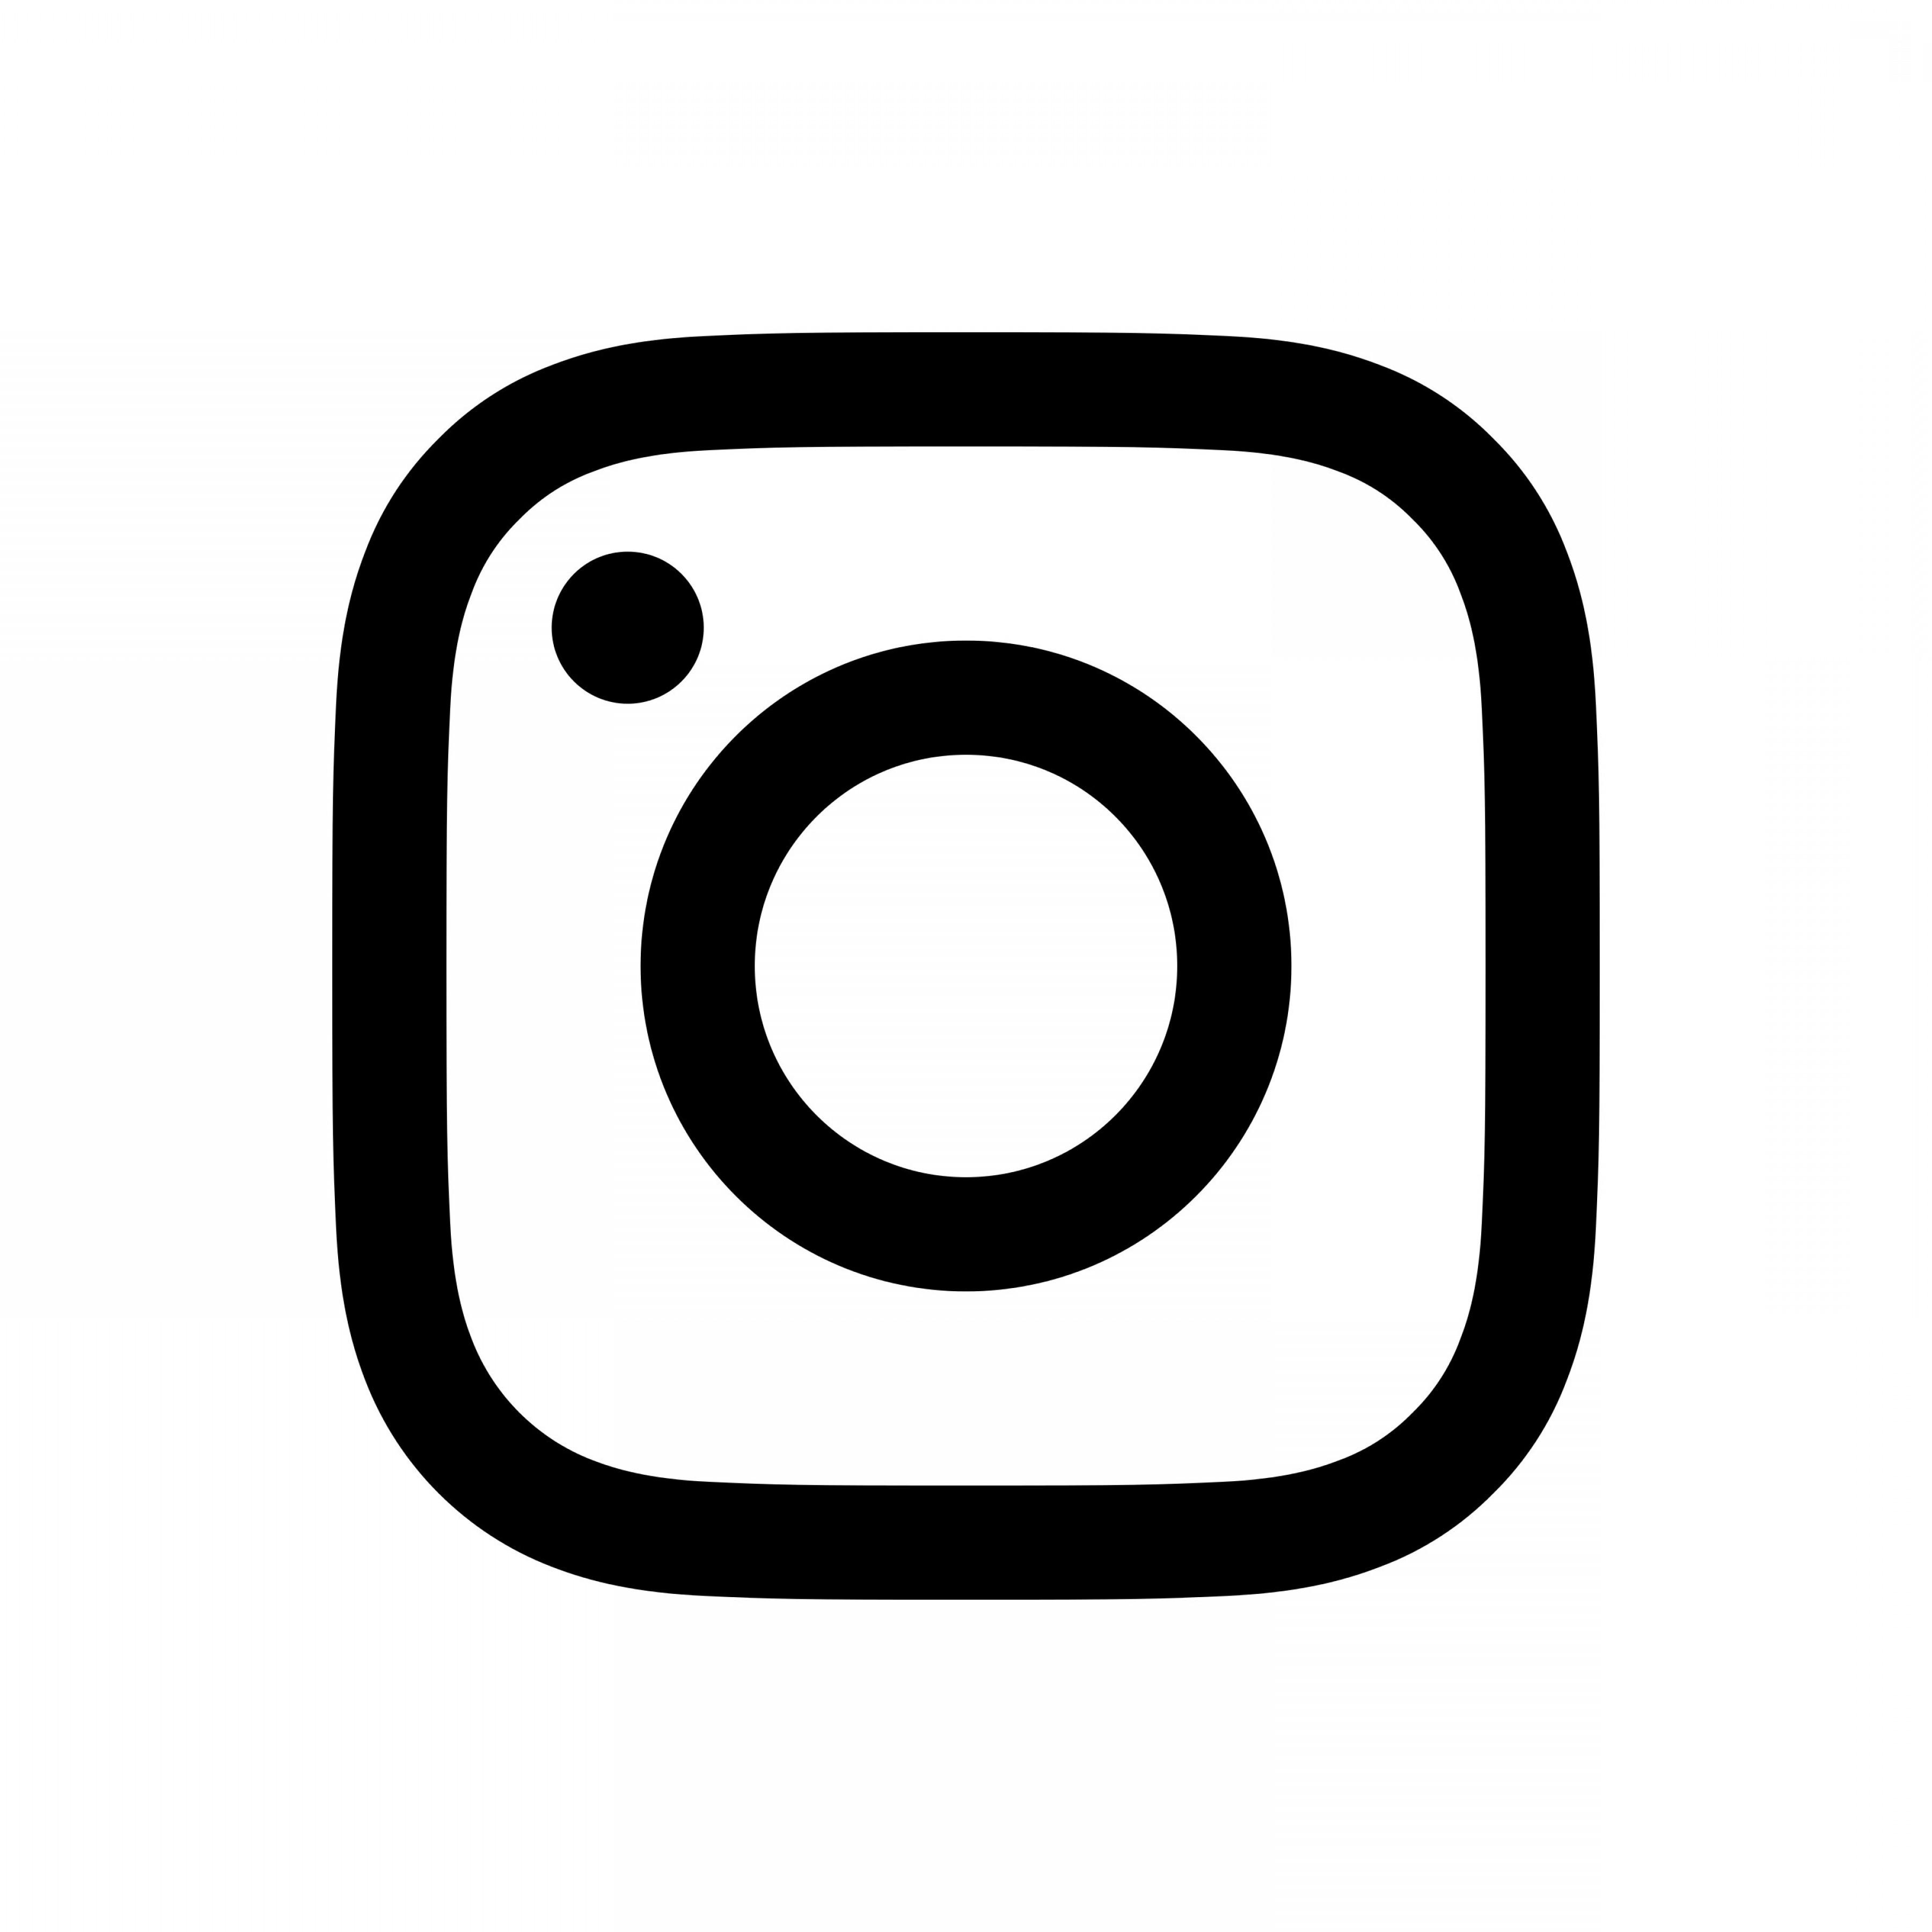 3600x3600 Instagram Logo Black And White Transparent Geekchicpro